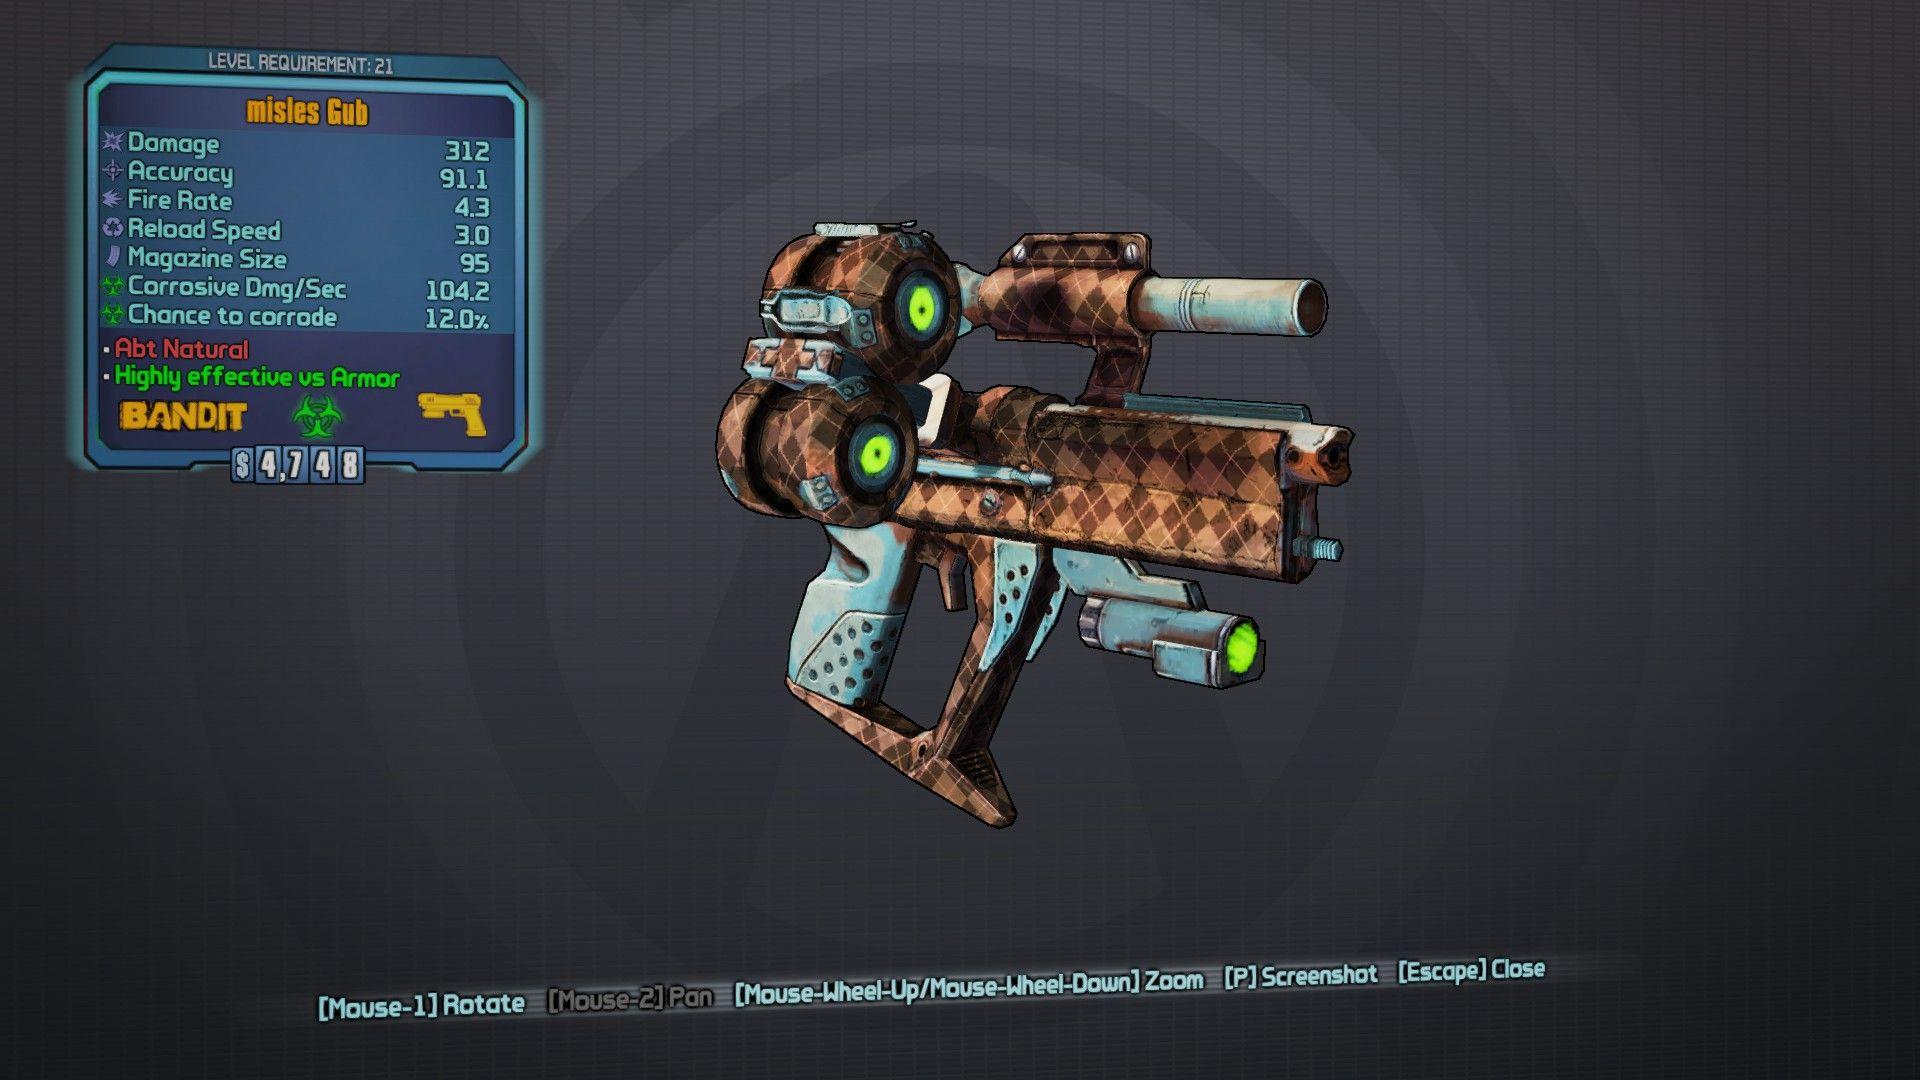 Gub Legendary pistol Borderlands series, Borderlands